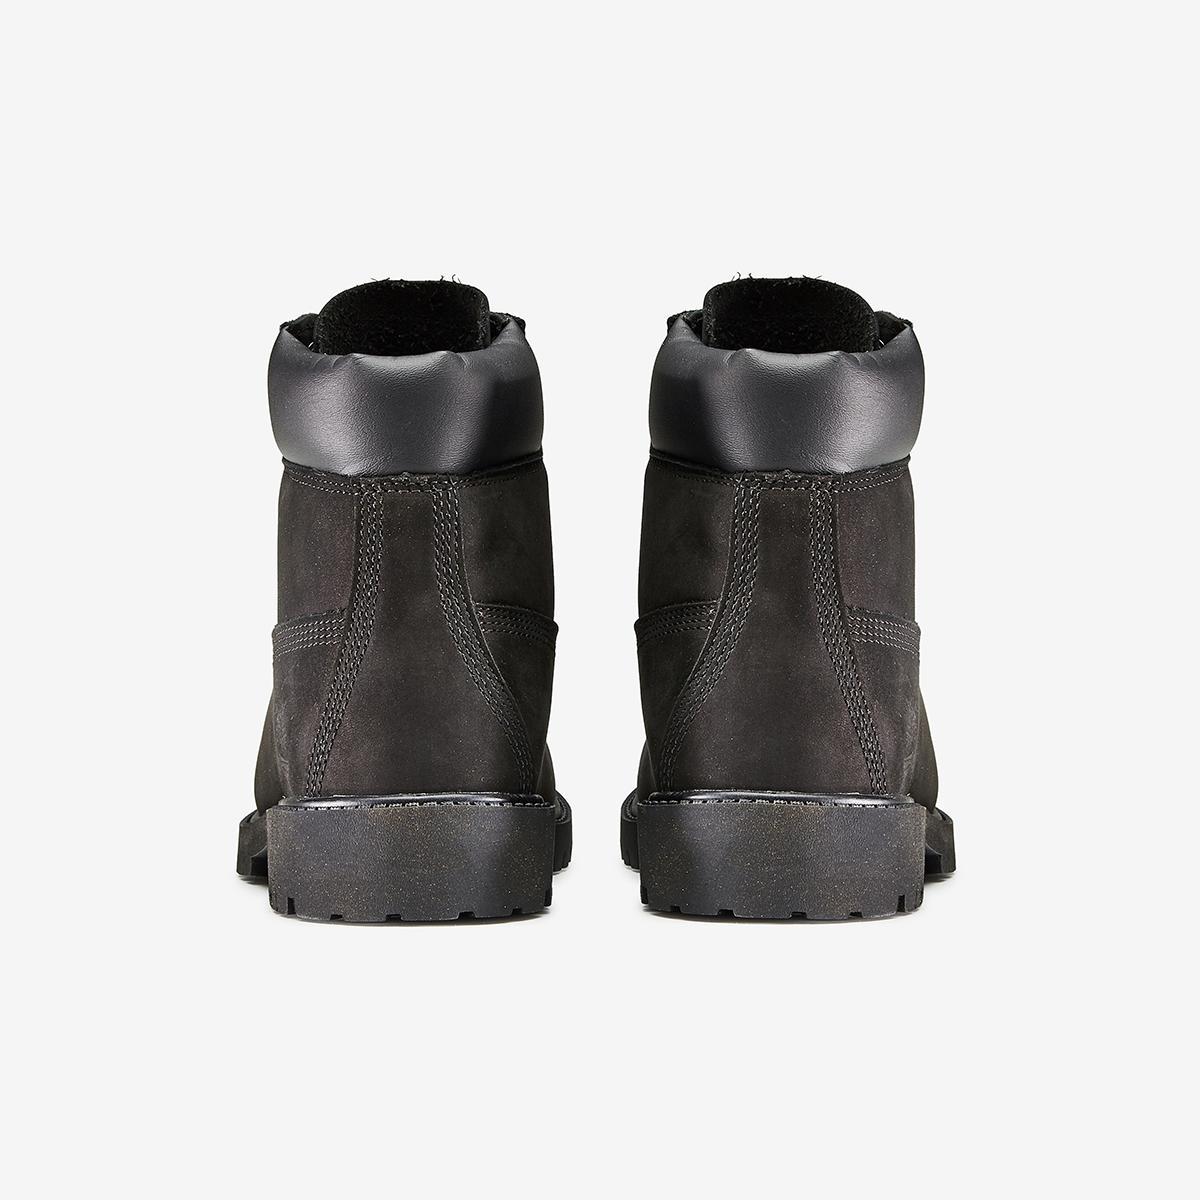 Timberland Toddler 6 Inch Premium Waterproof Boots